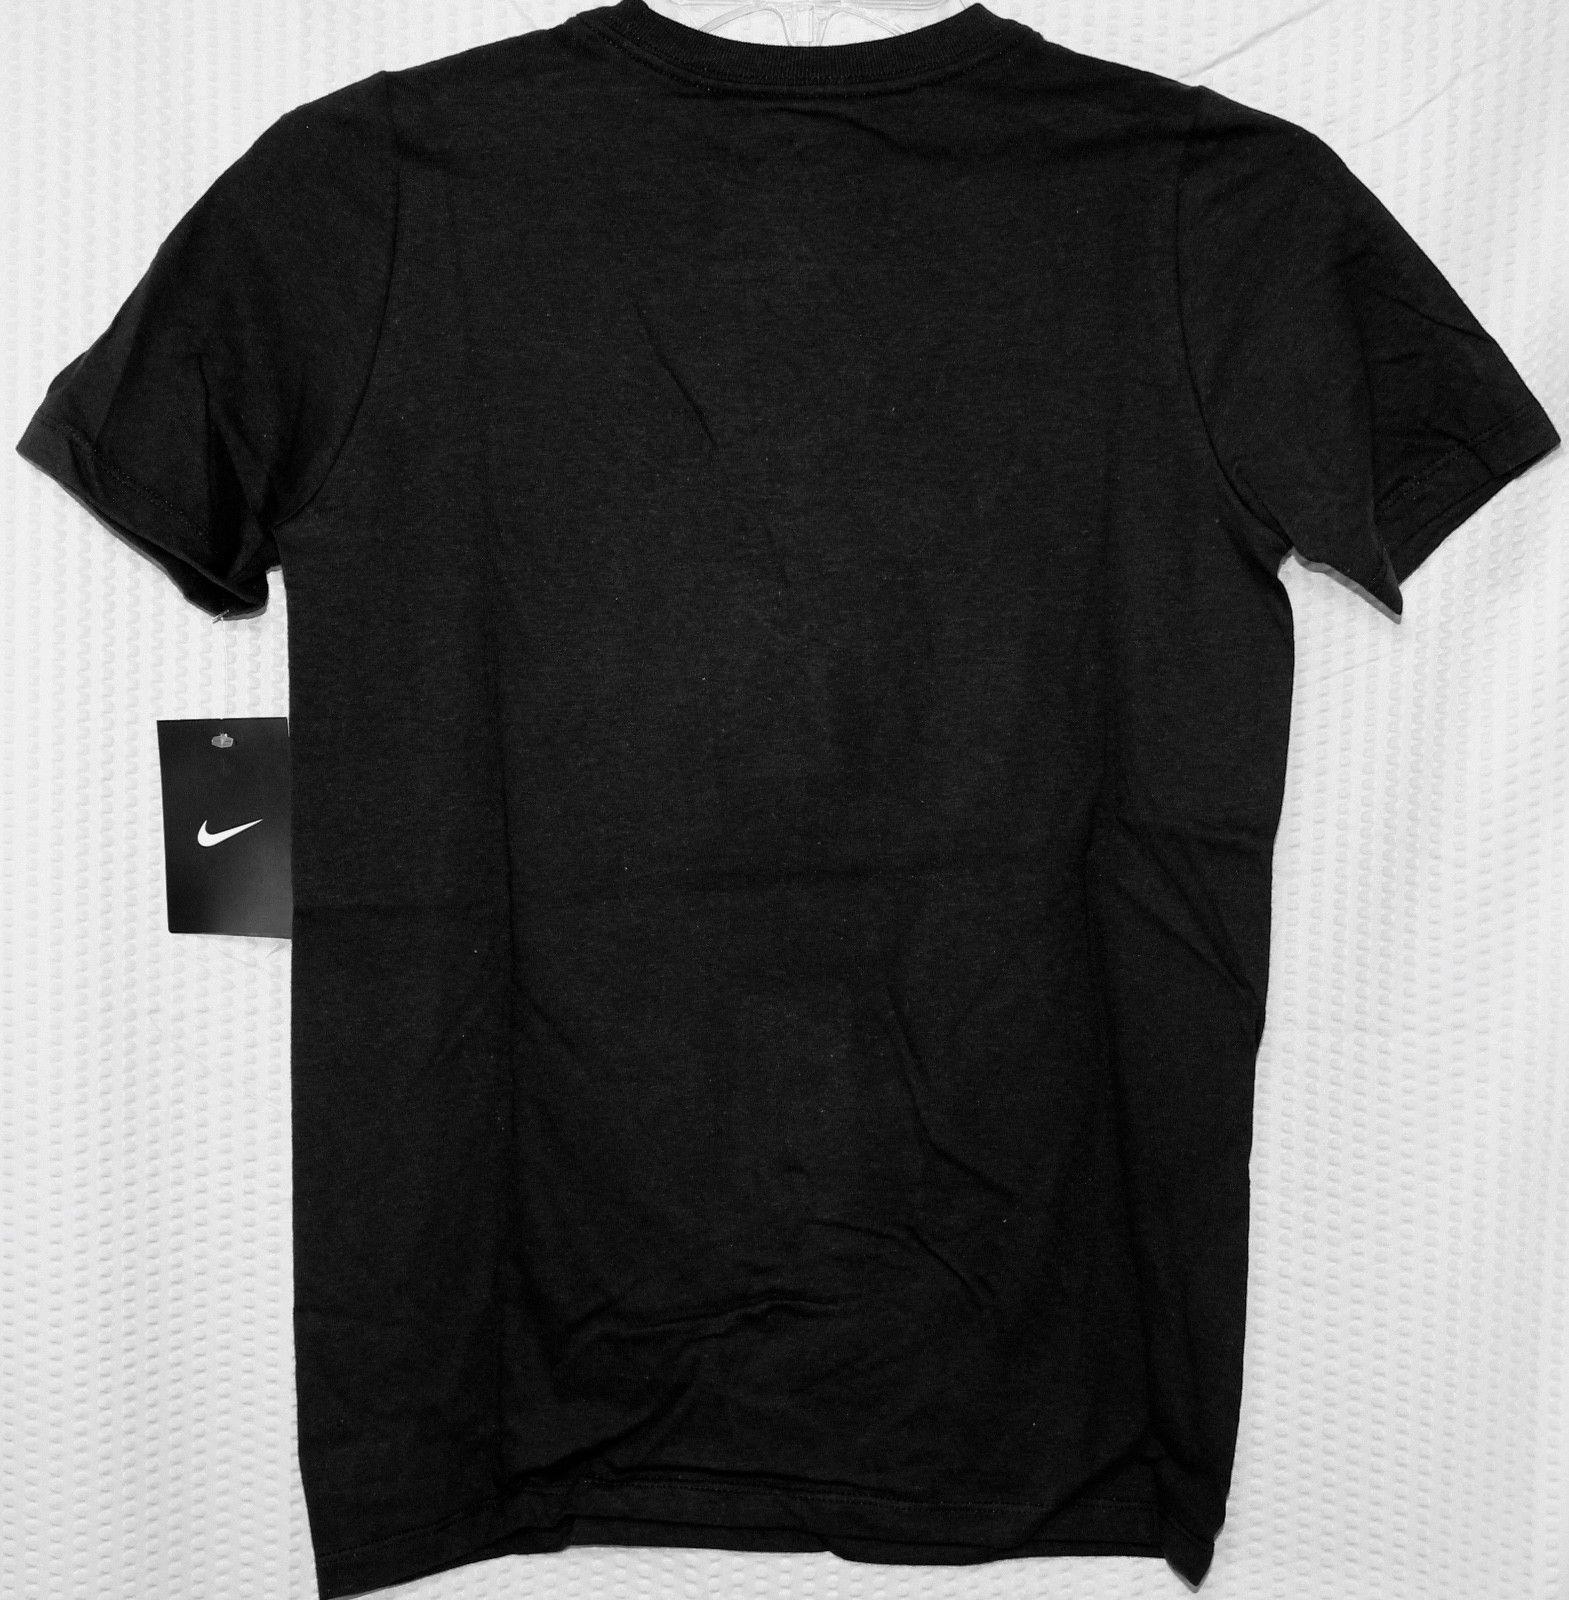 AJ2182-010 NIKE SWOOSH LOGO BOYS T-SHIRT SHIRT BLACK